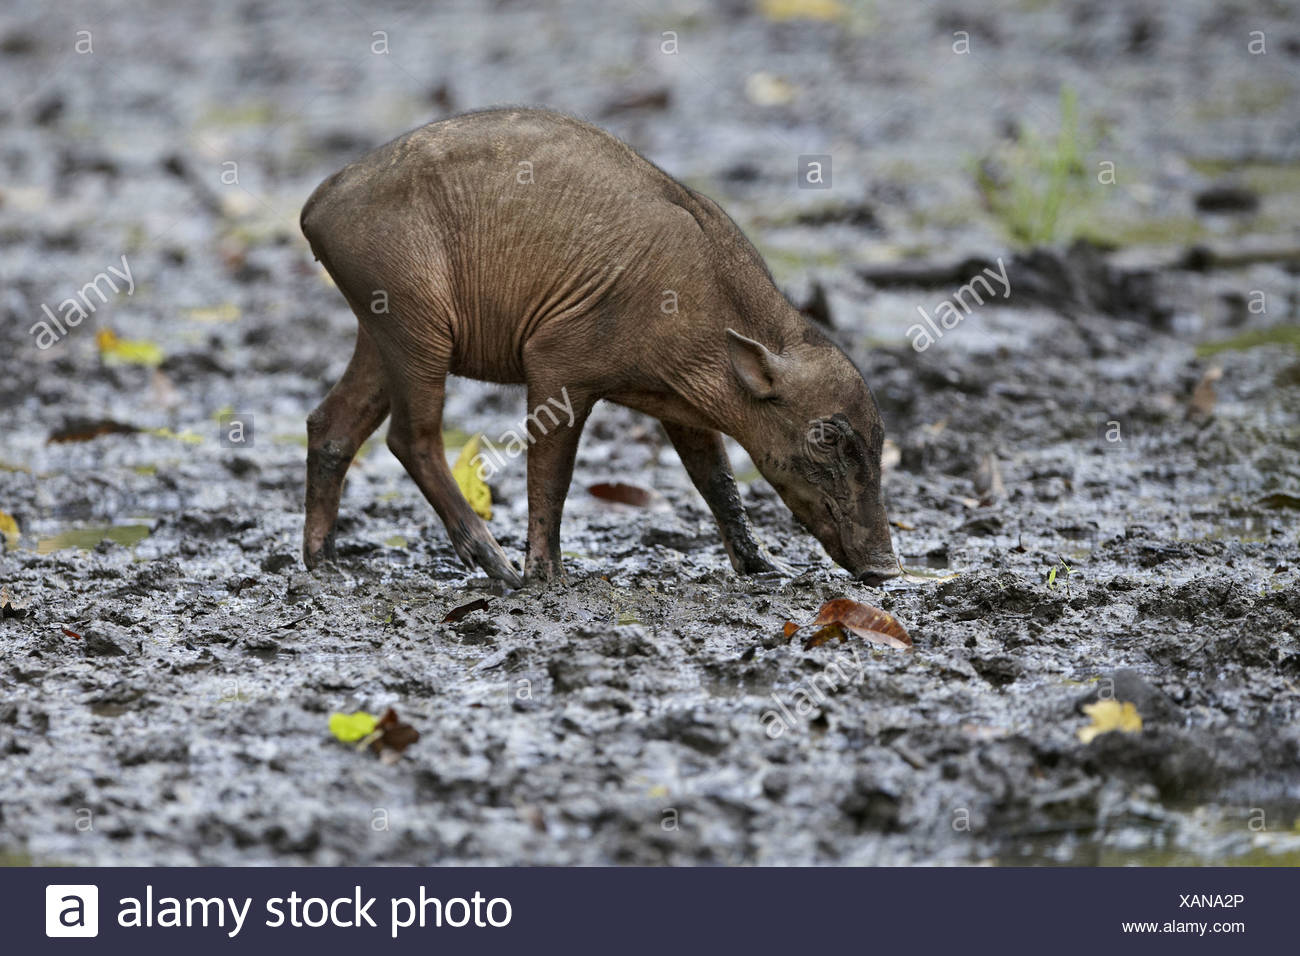 North Sulawesi Babirusa (Babyrousa celebensis) young, walking in mud at salt lick, Nantu Reserve, Sulawesi, Indonesia - Stock Image